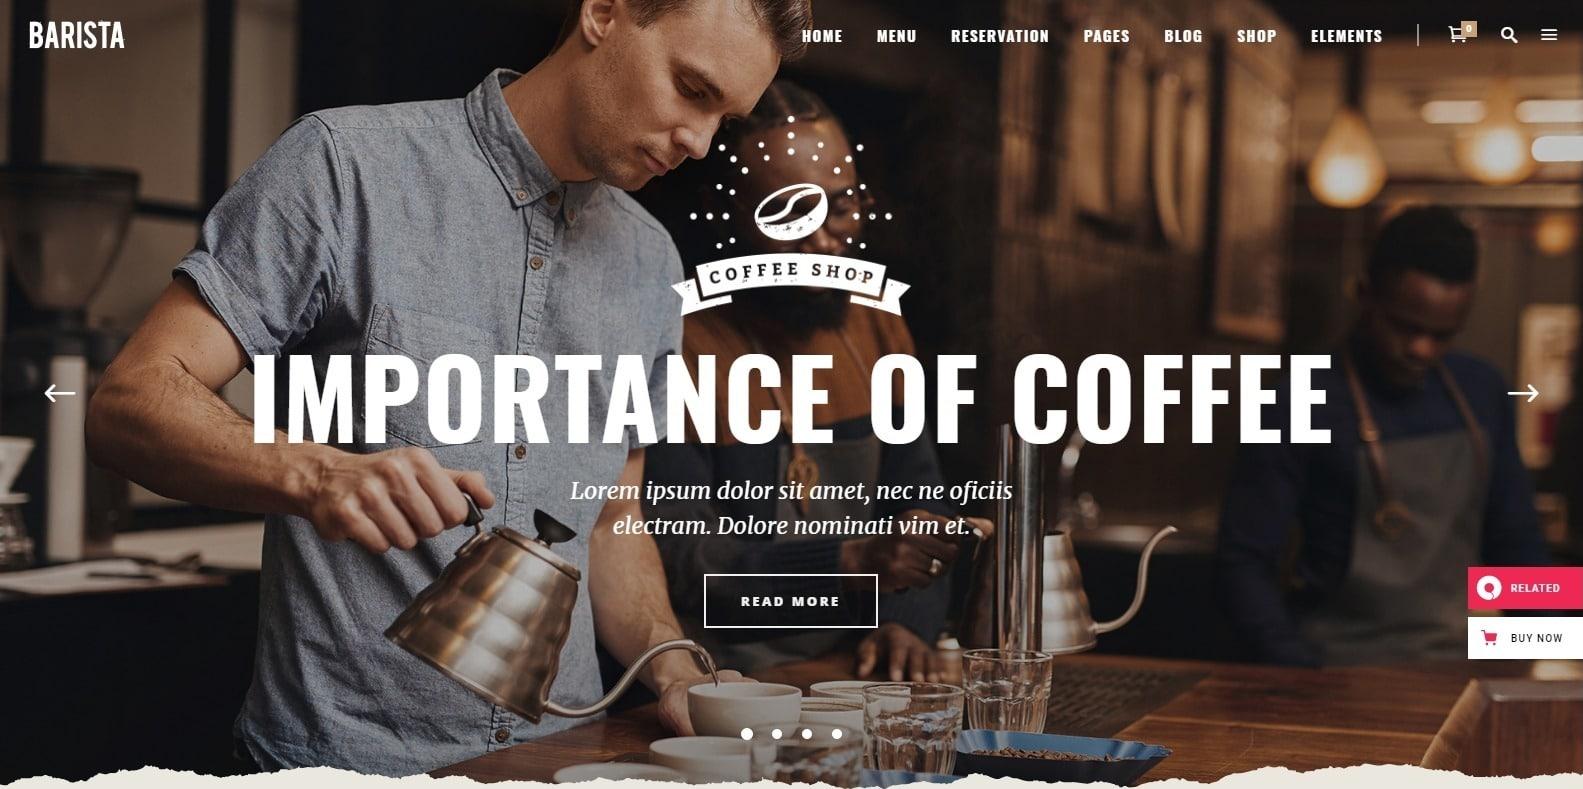 barista-coffee-shop-website-template